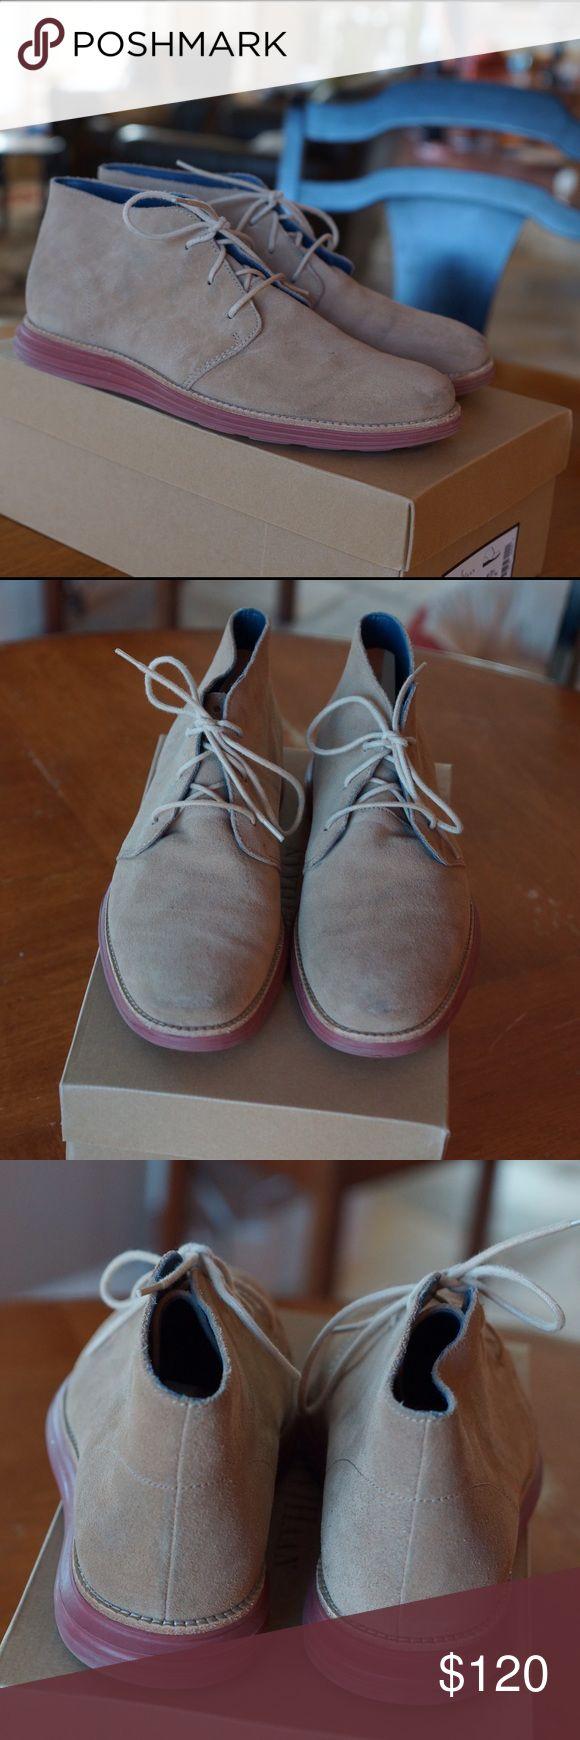 Cole Haan men's Lunargrand Chukka boots. Sz 10.5. Men's Cole Haan Lunargrand Chukka boots. Lightly worn. Milkshake color.  Stored in original box with shoe trees. Non smoking home. Originally $280 USD. Cole Haan Shoes Chukka Boots